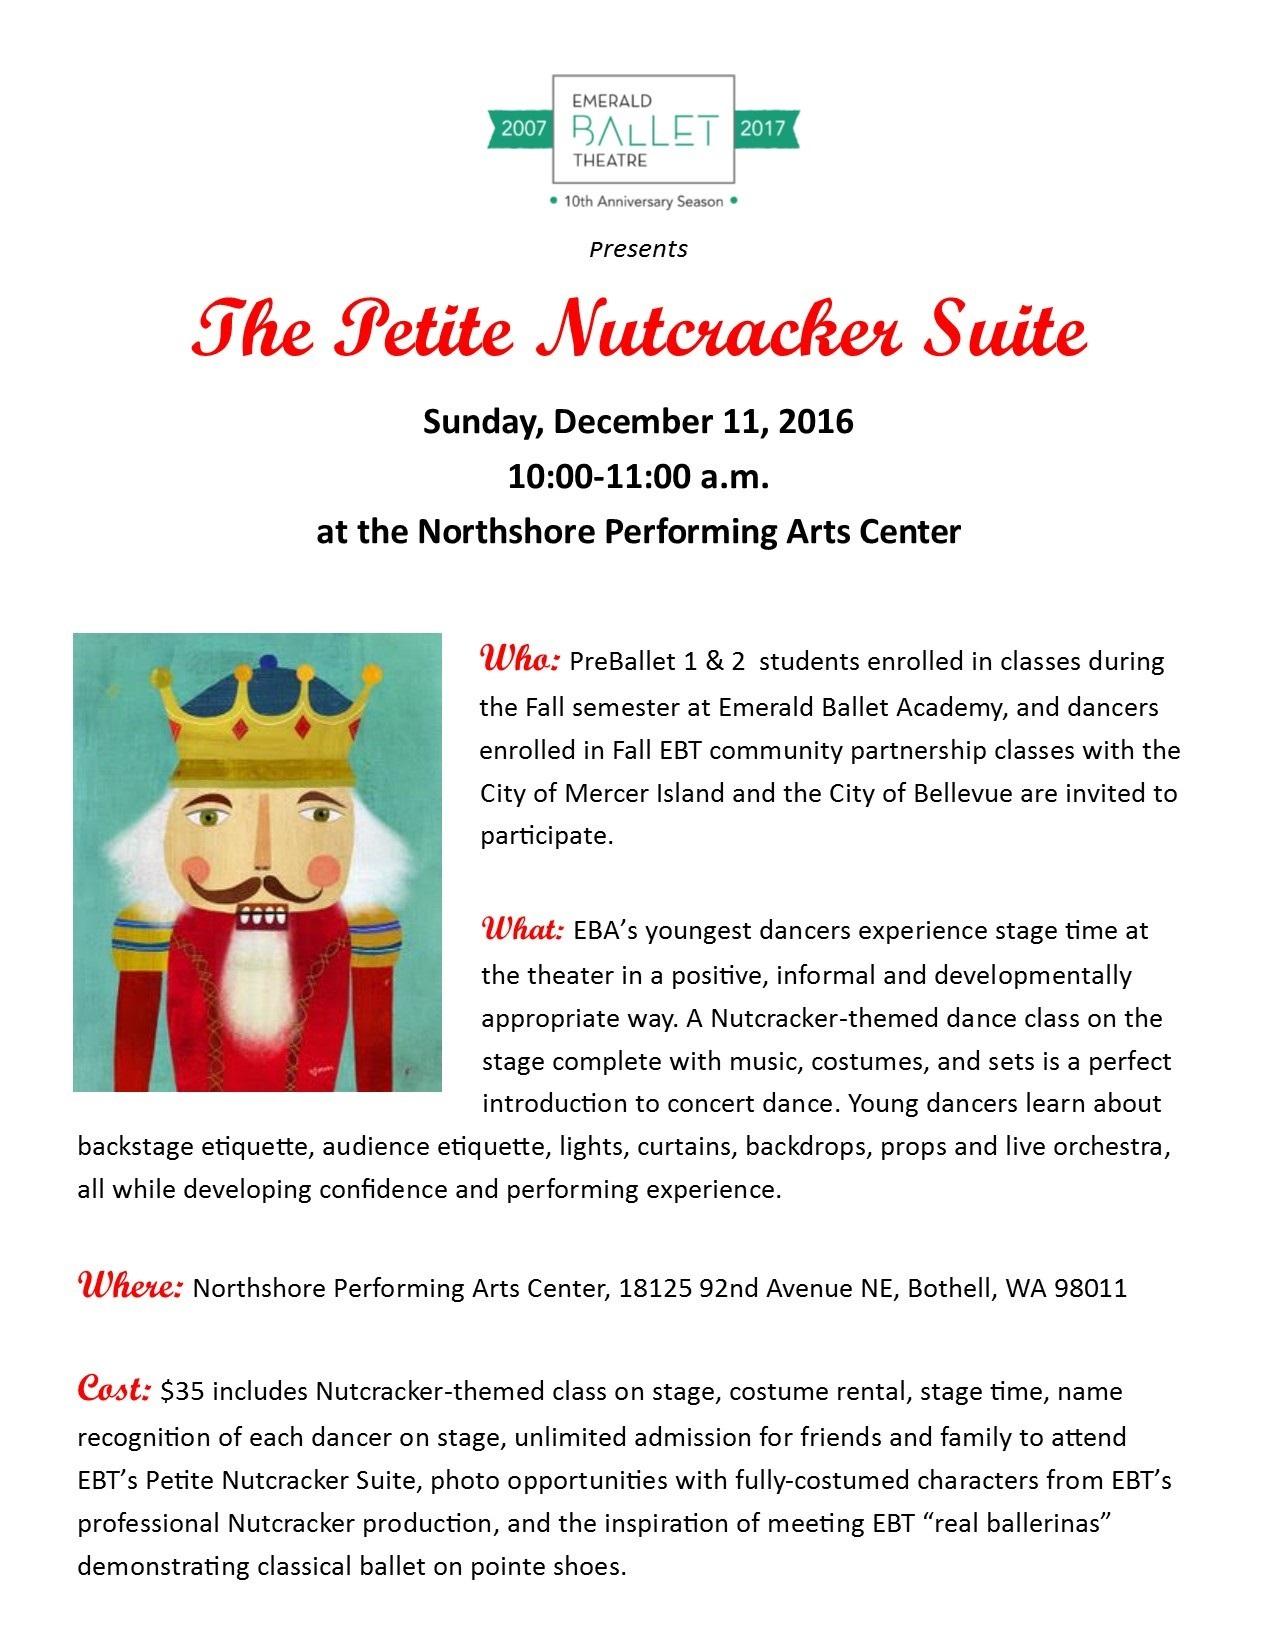 Petite Nutcracker Suite 2016 Flyer.jpg